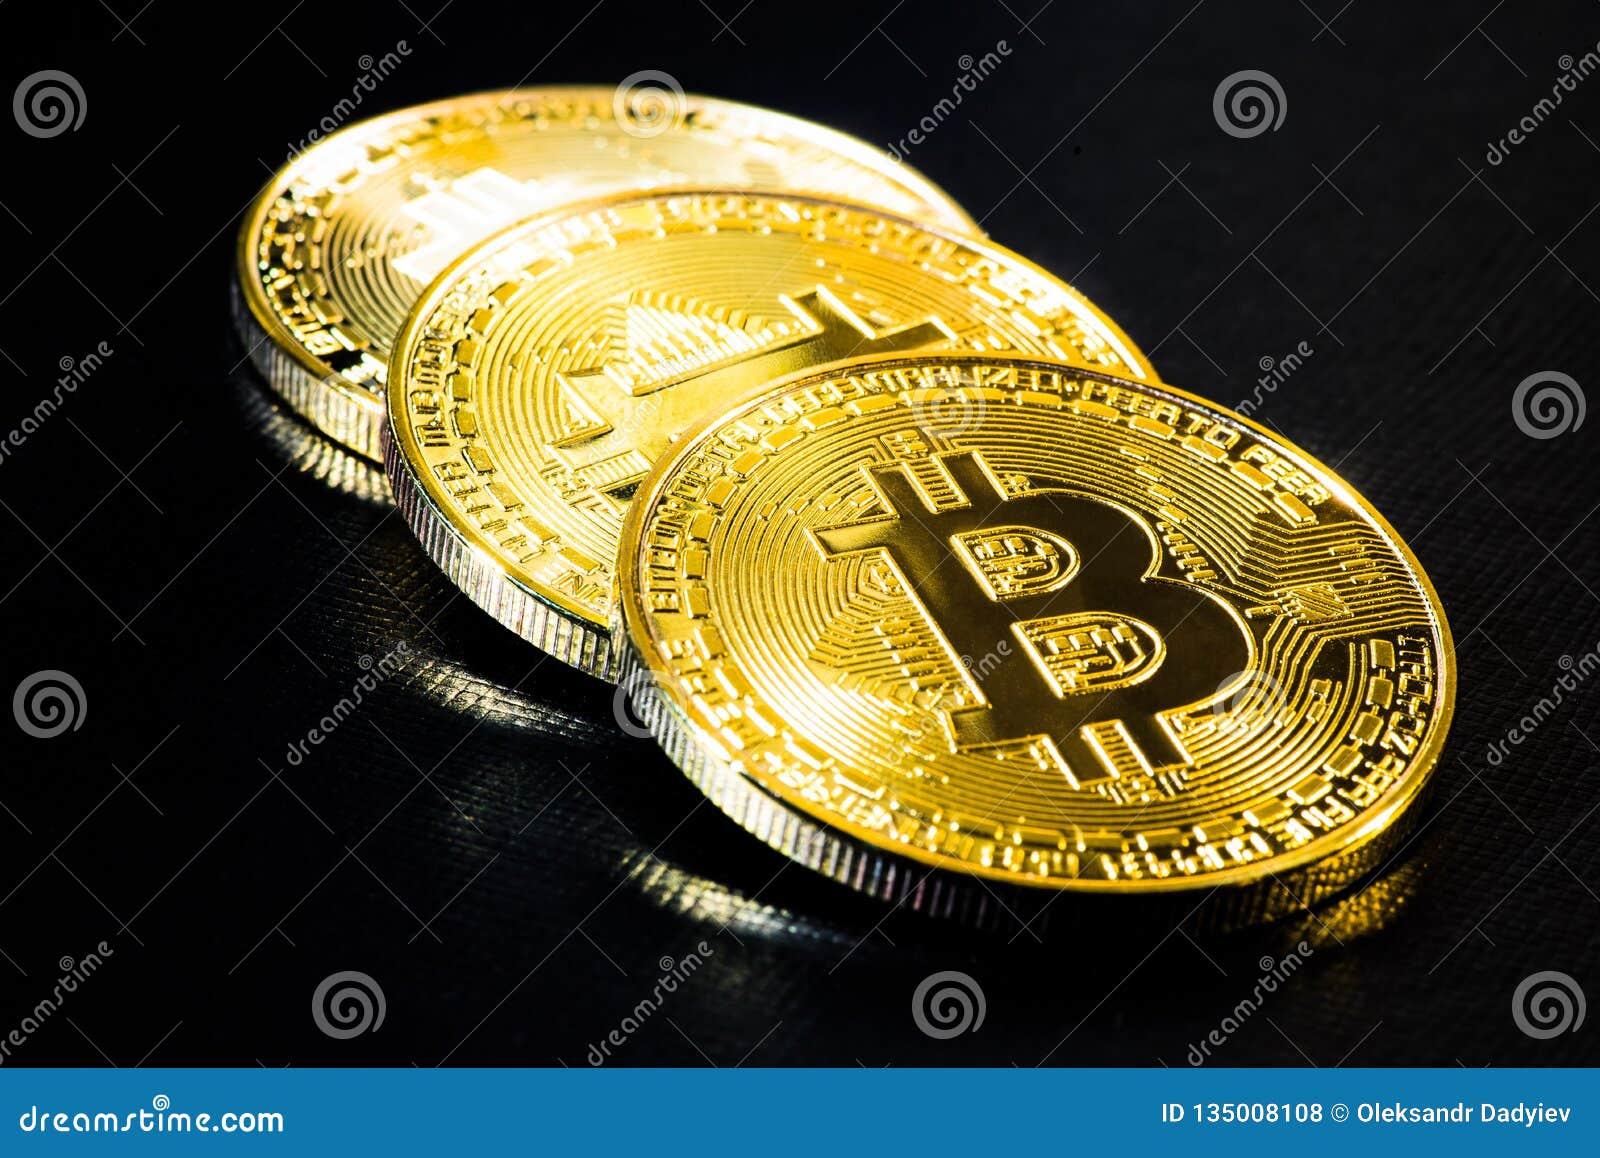 3 bitcoins sports betting calculator parlay